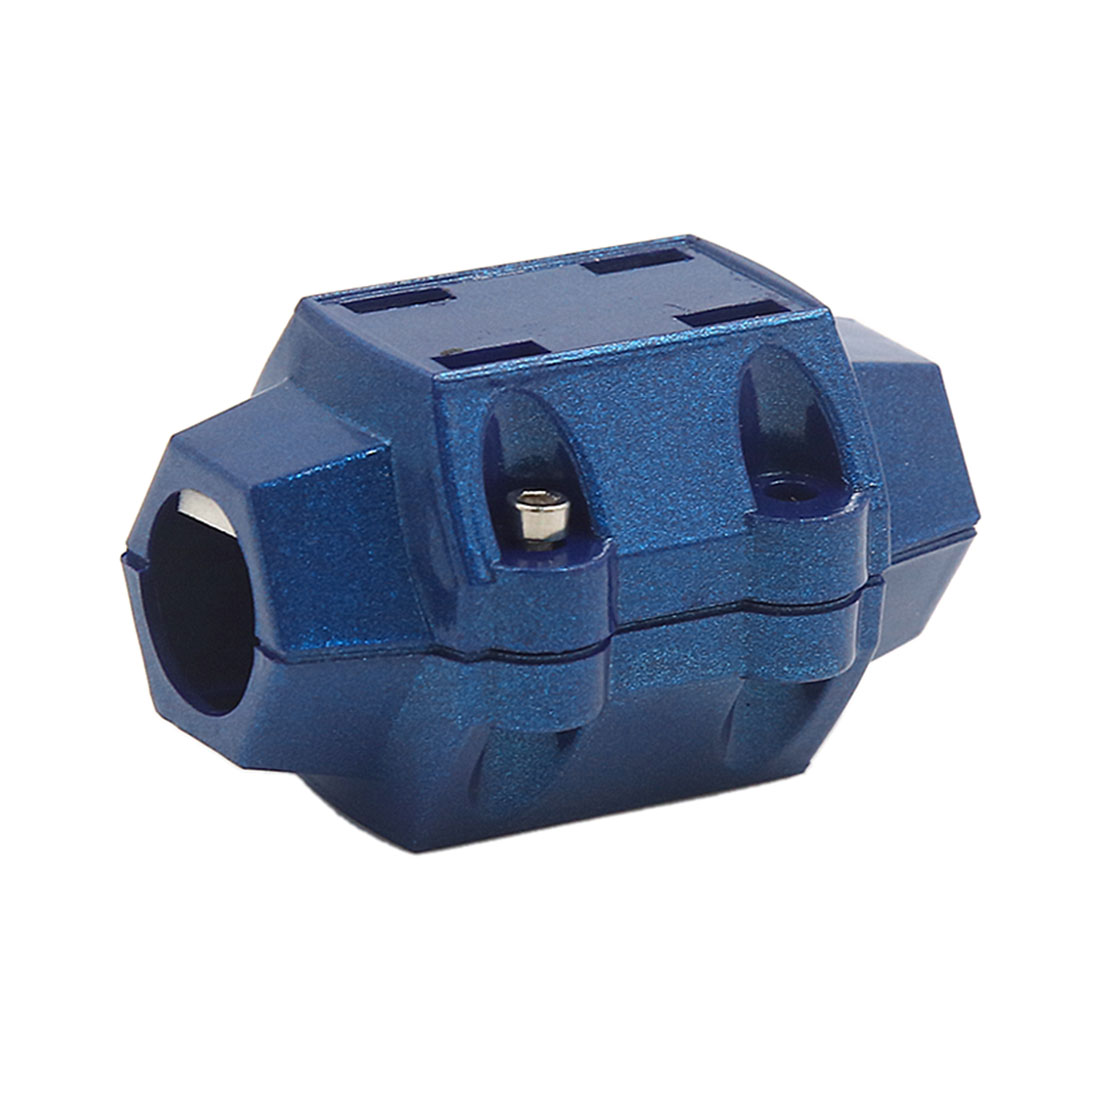 Universal Dark Blue Double Magnet Economizer Fuel Gas Saver for Trucks Cars